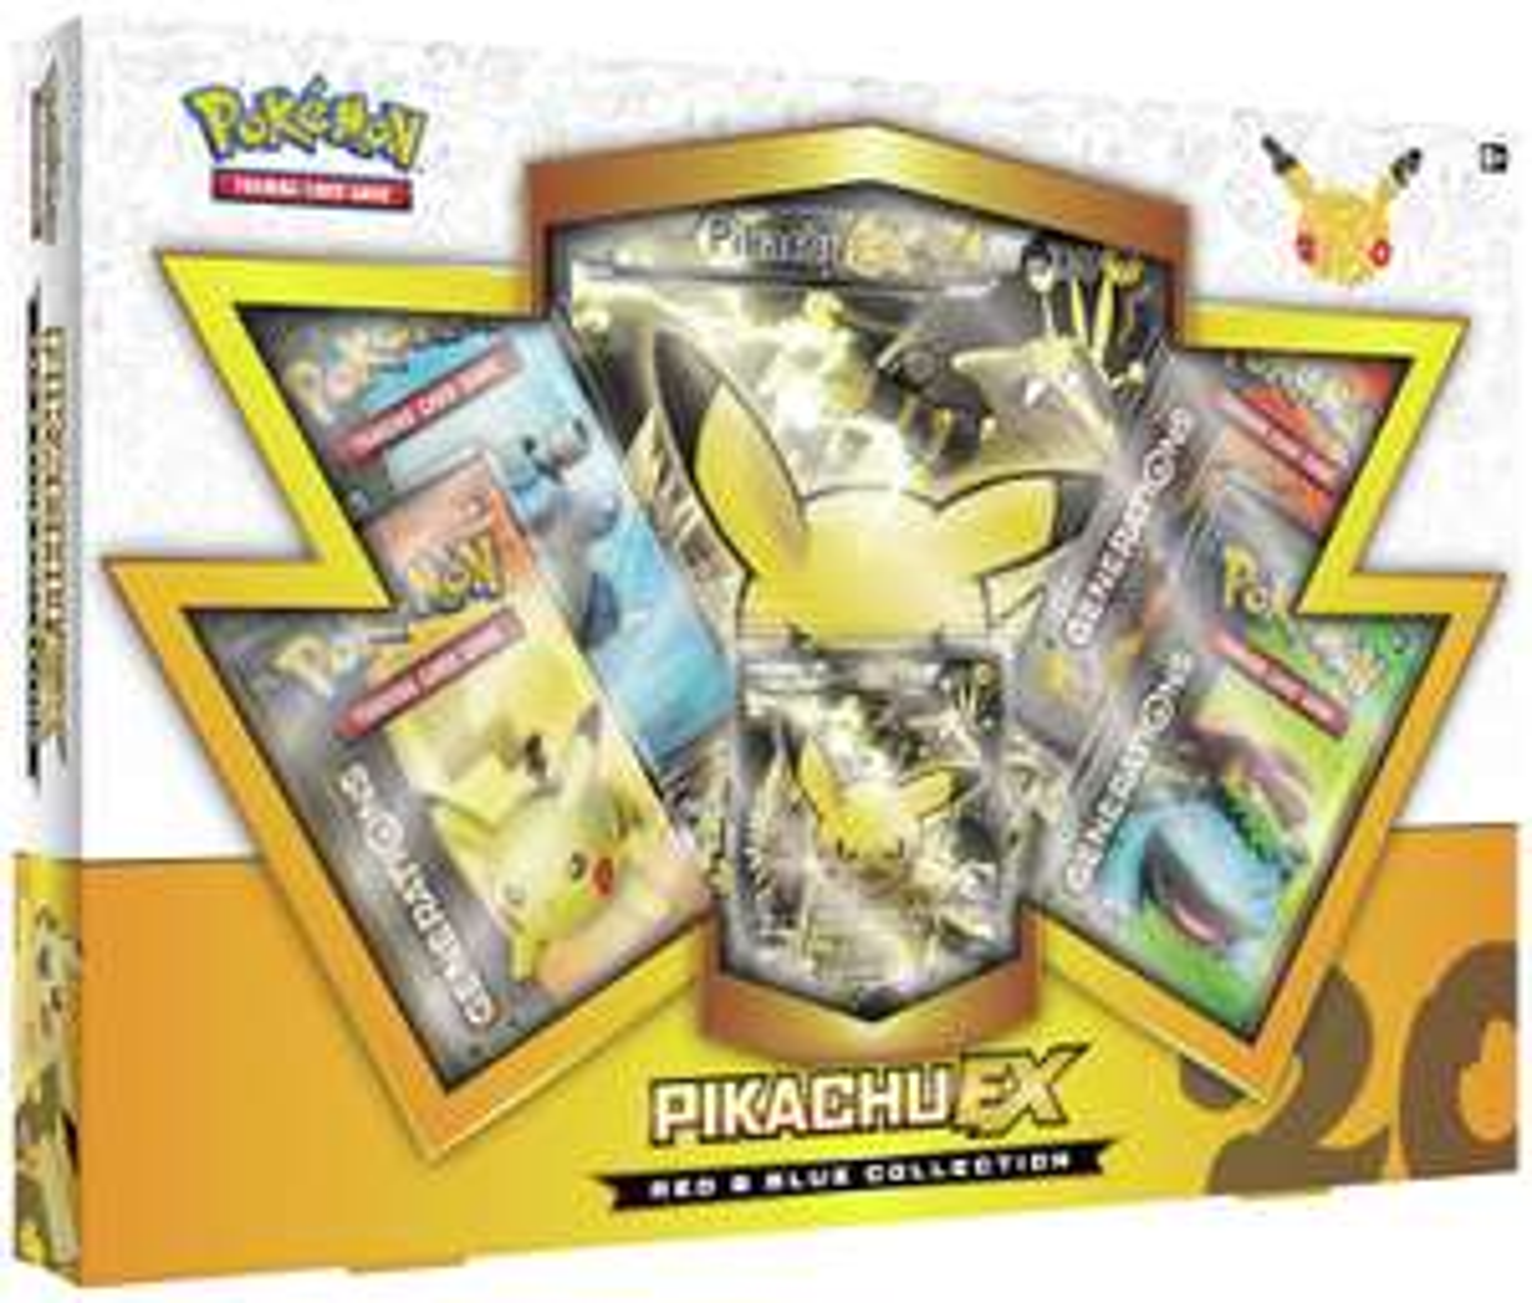 Pokemon Collection Box Assortment £13.50 Argos